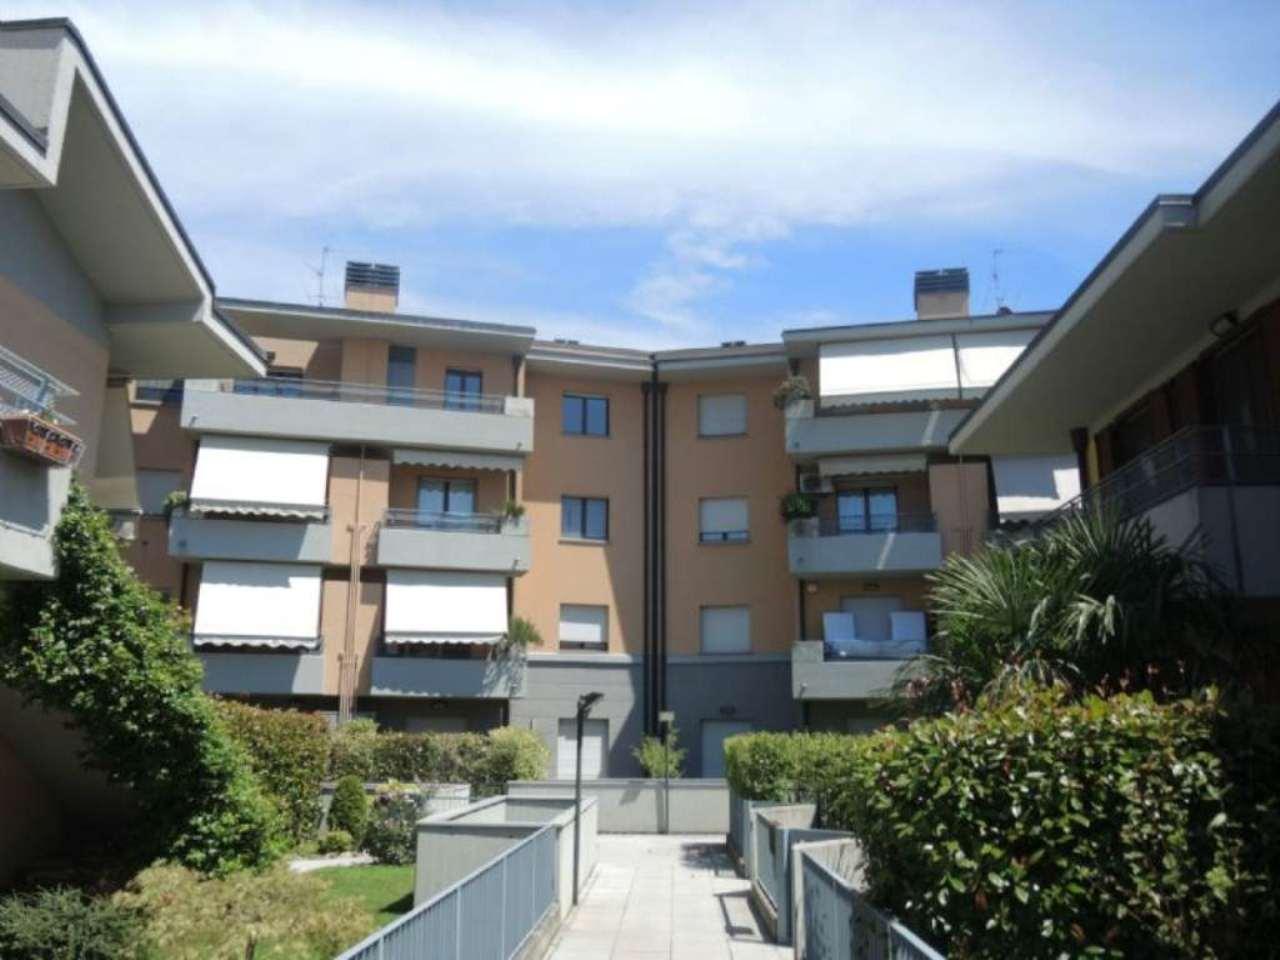 Bilocale Scanzorosciate Via Gorizia 9